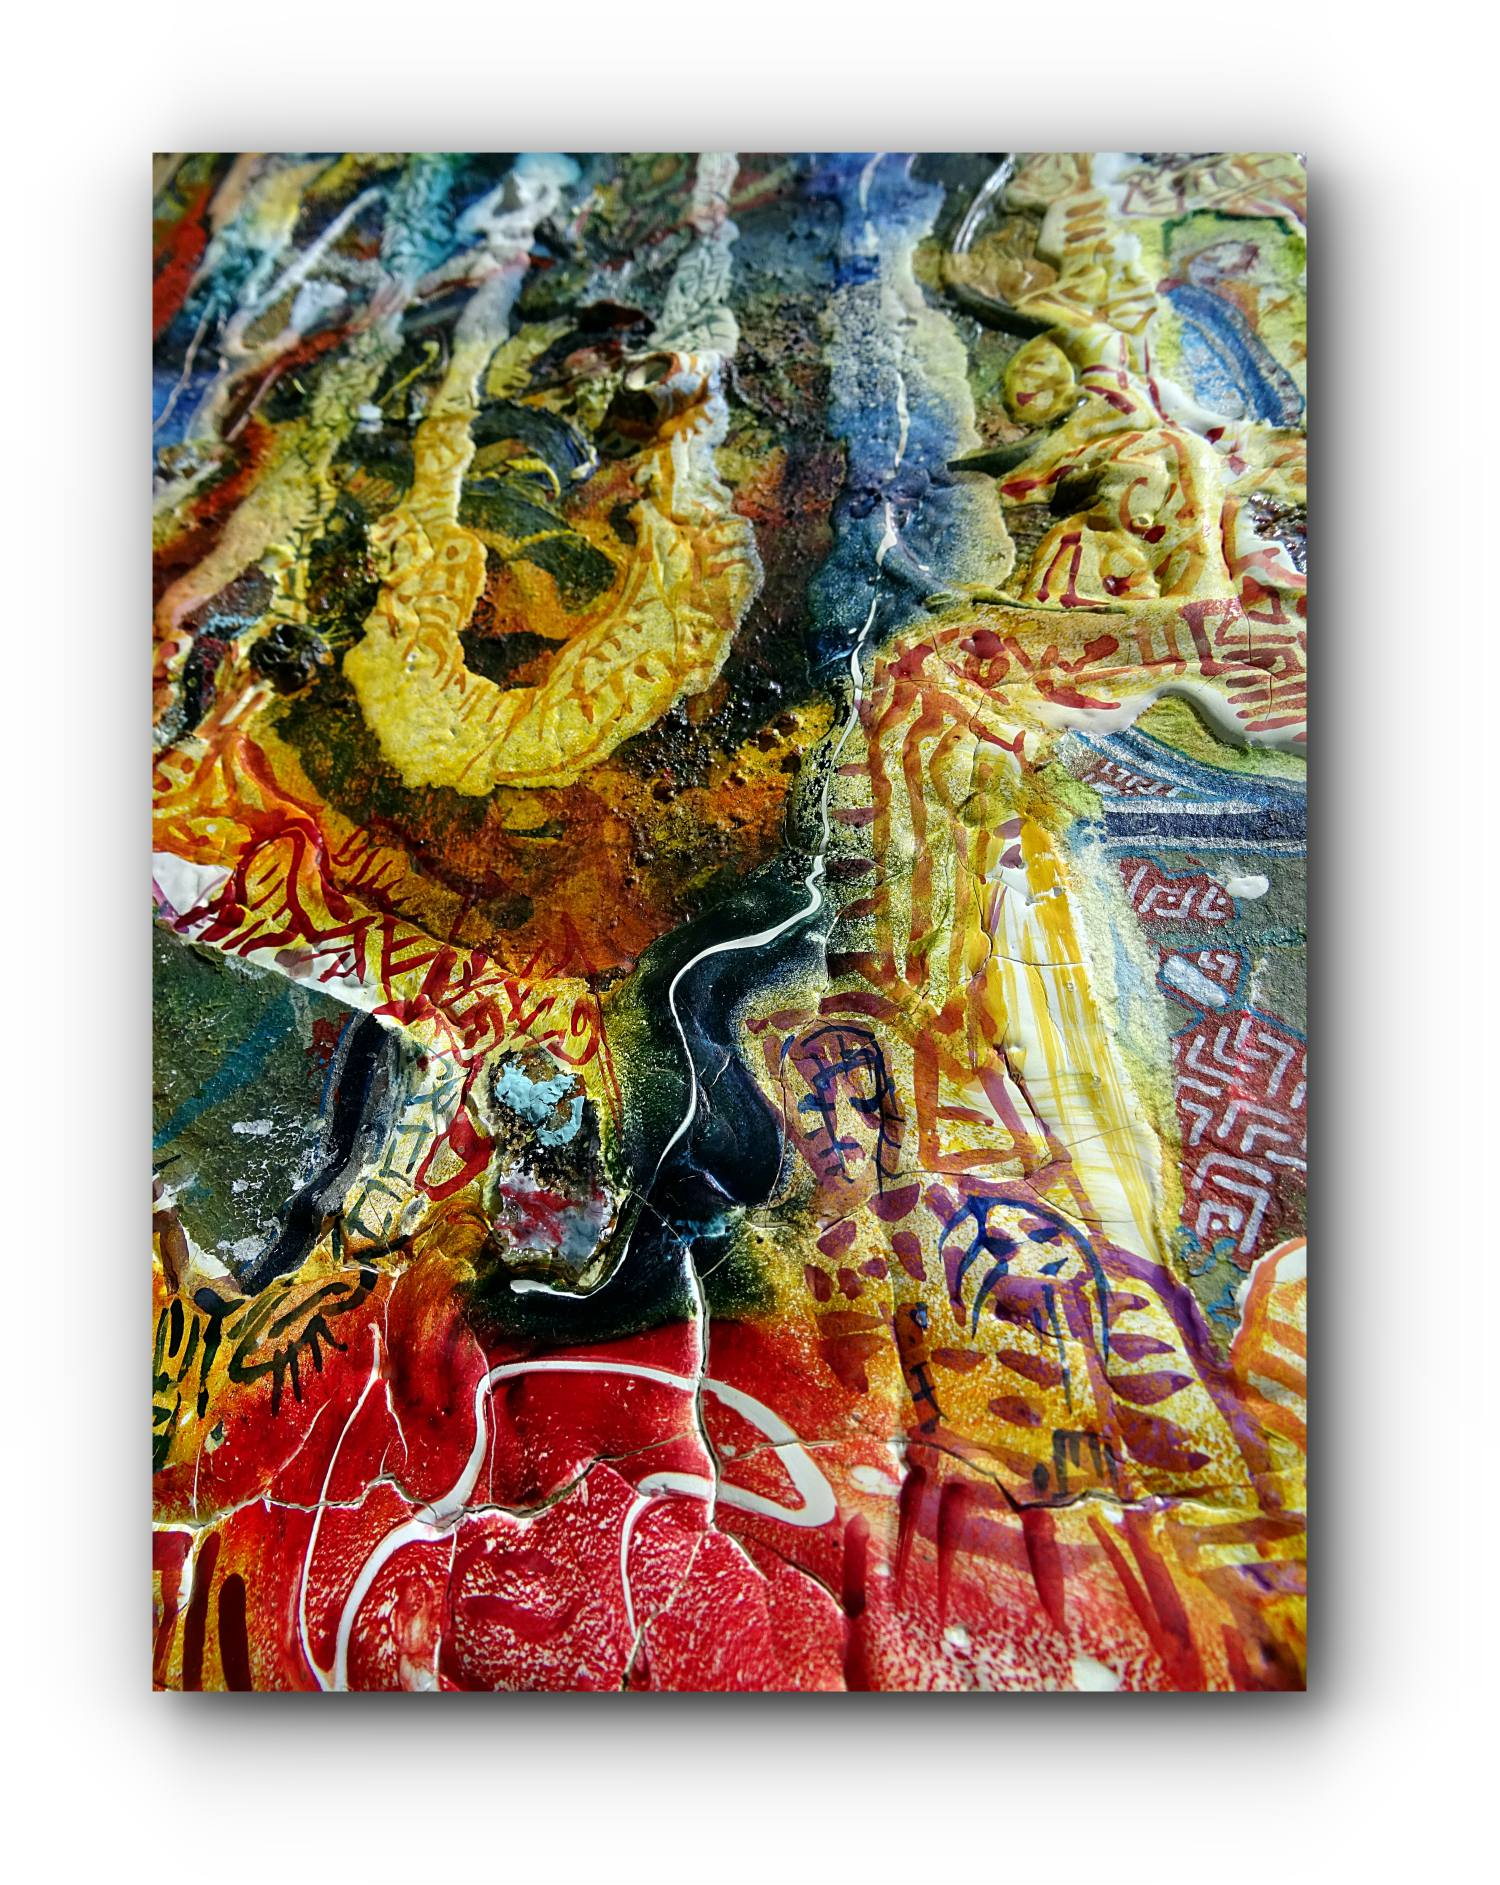 painting-detail-11-kiss-artist-duo-ingress-vortices.jpg